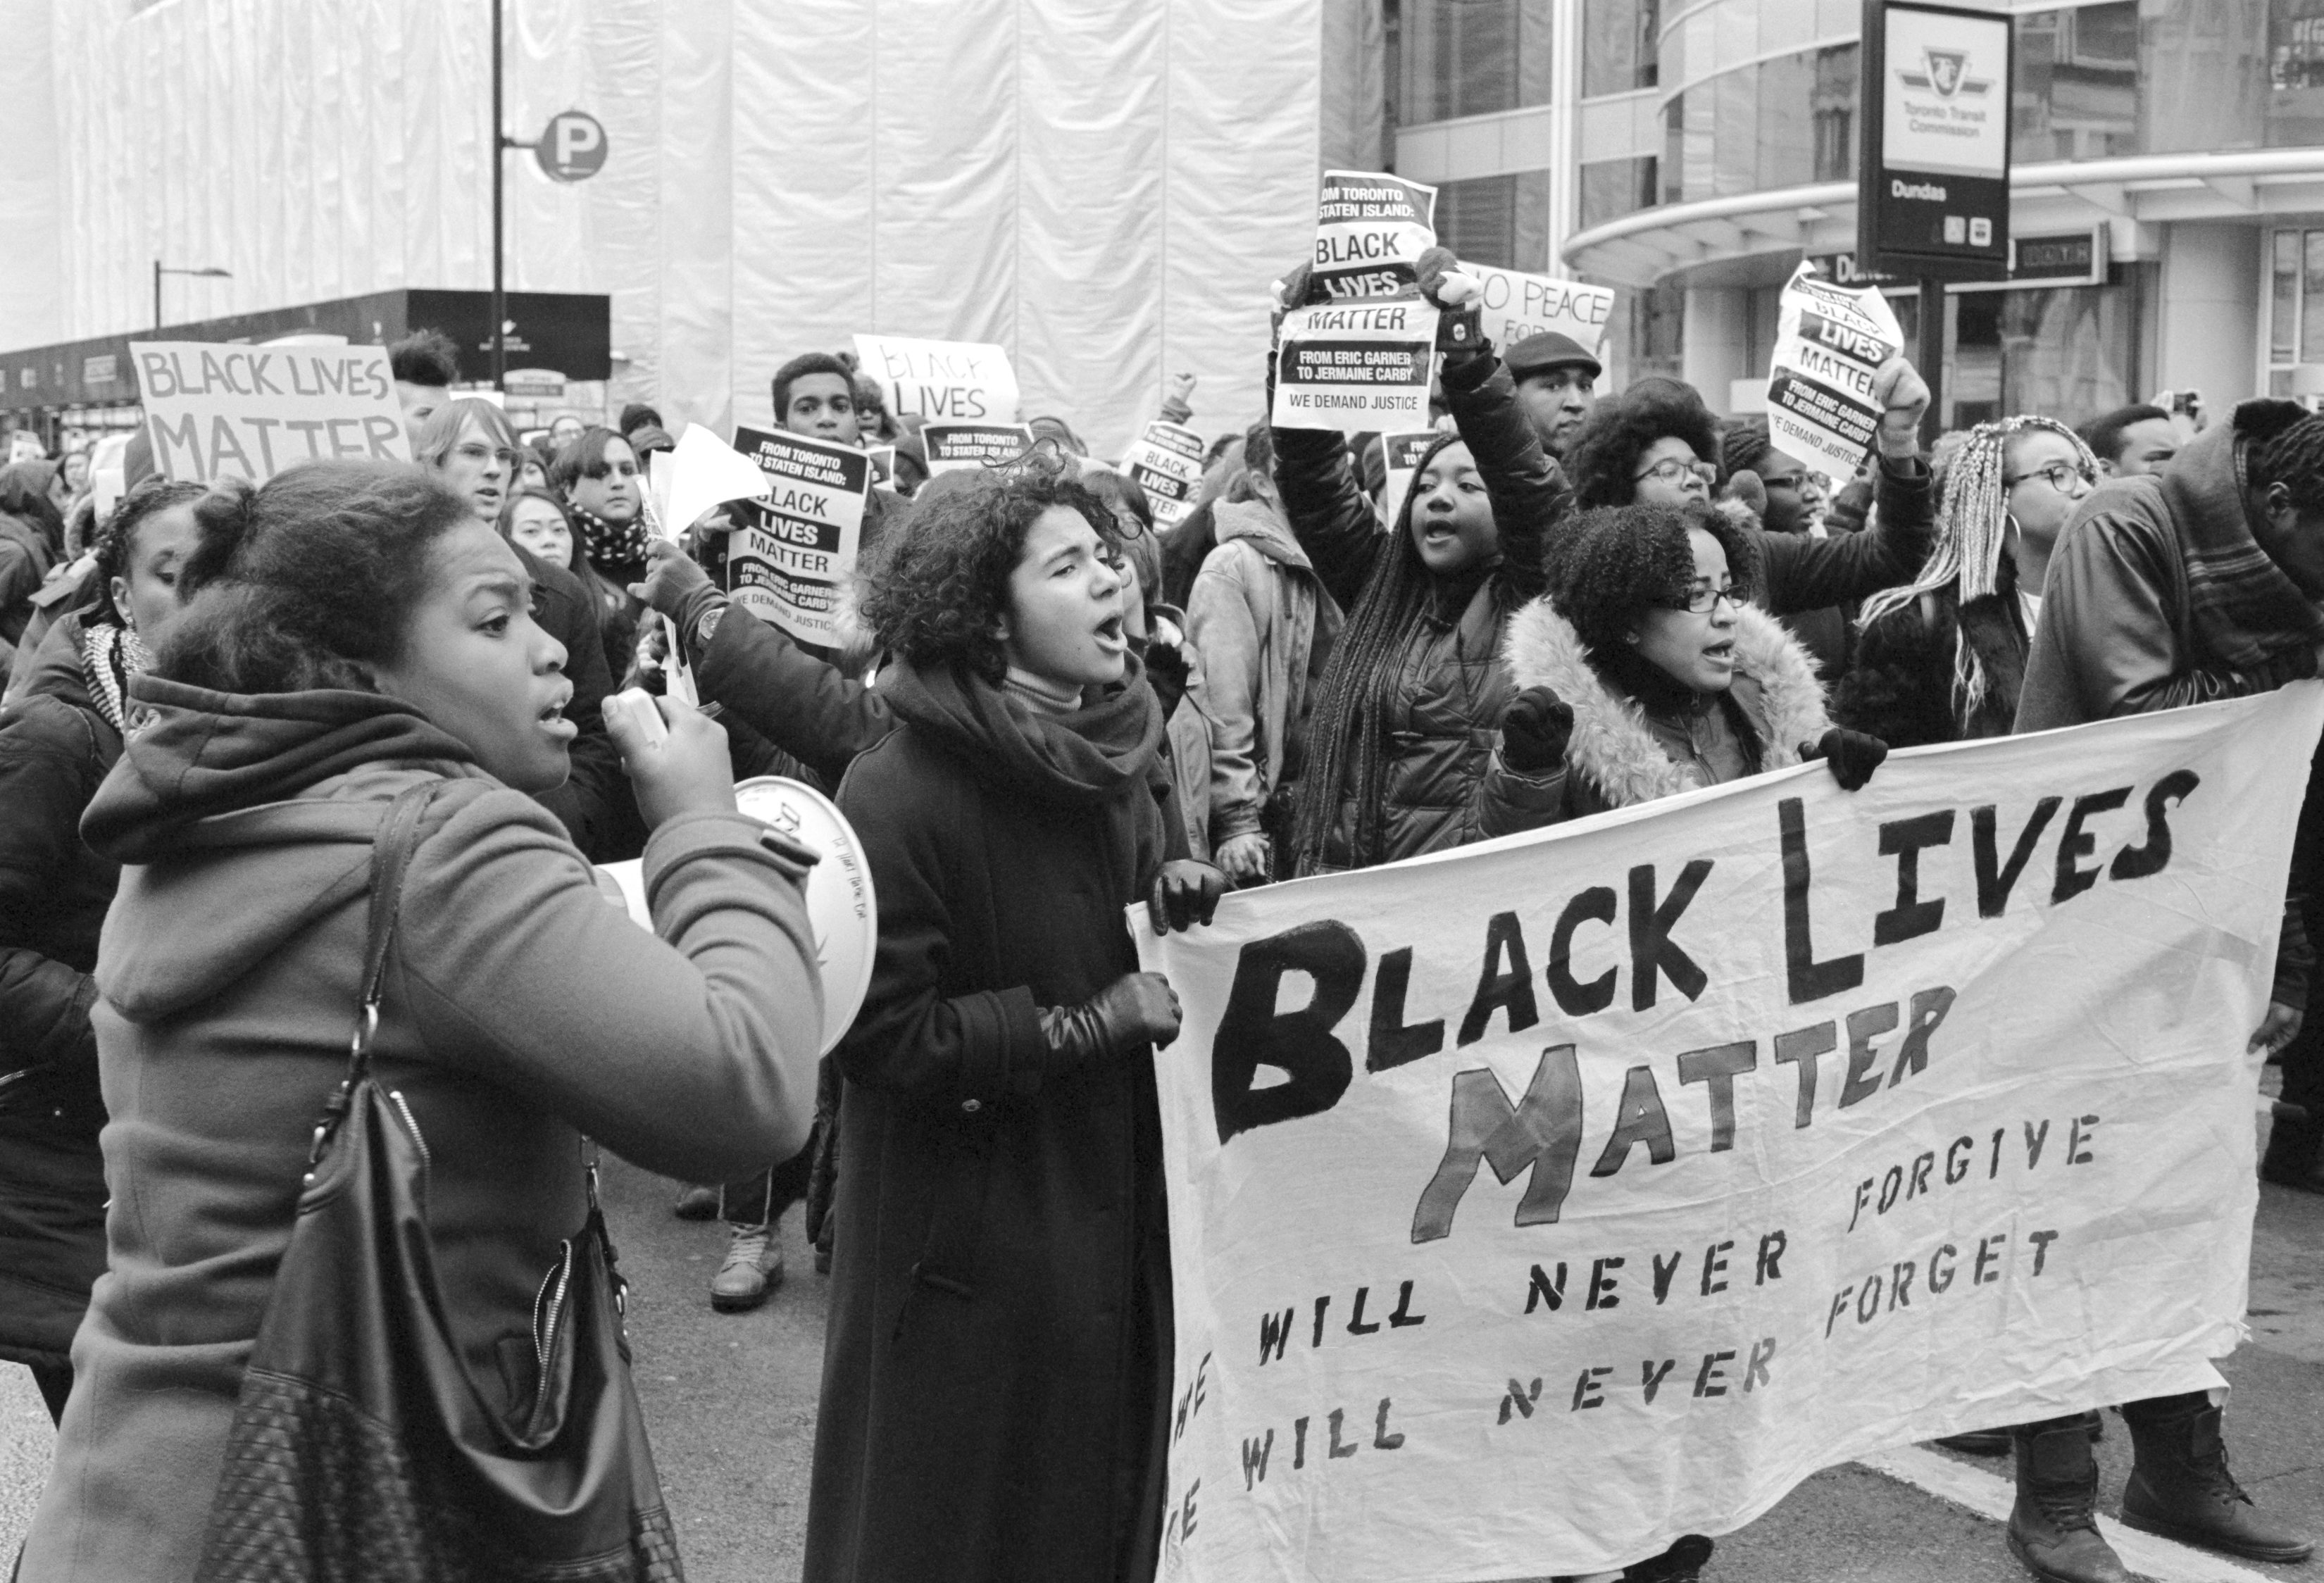 Black Lives Matter1 (Print)